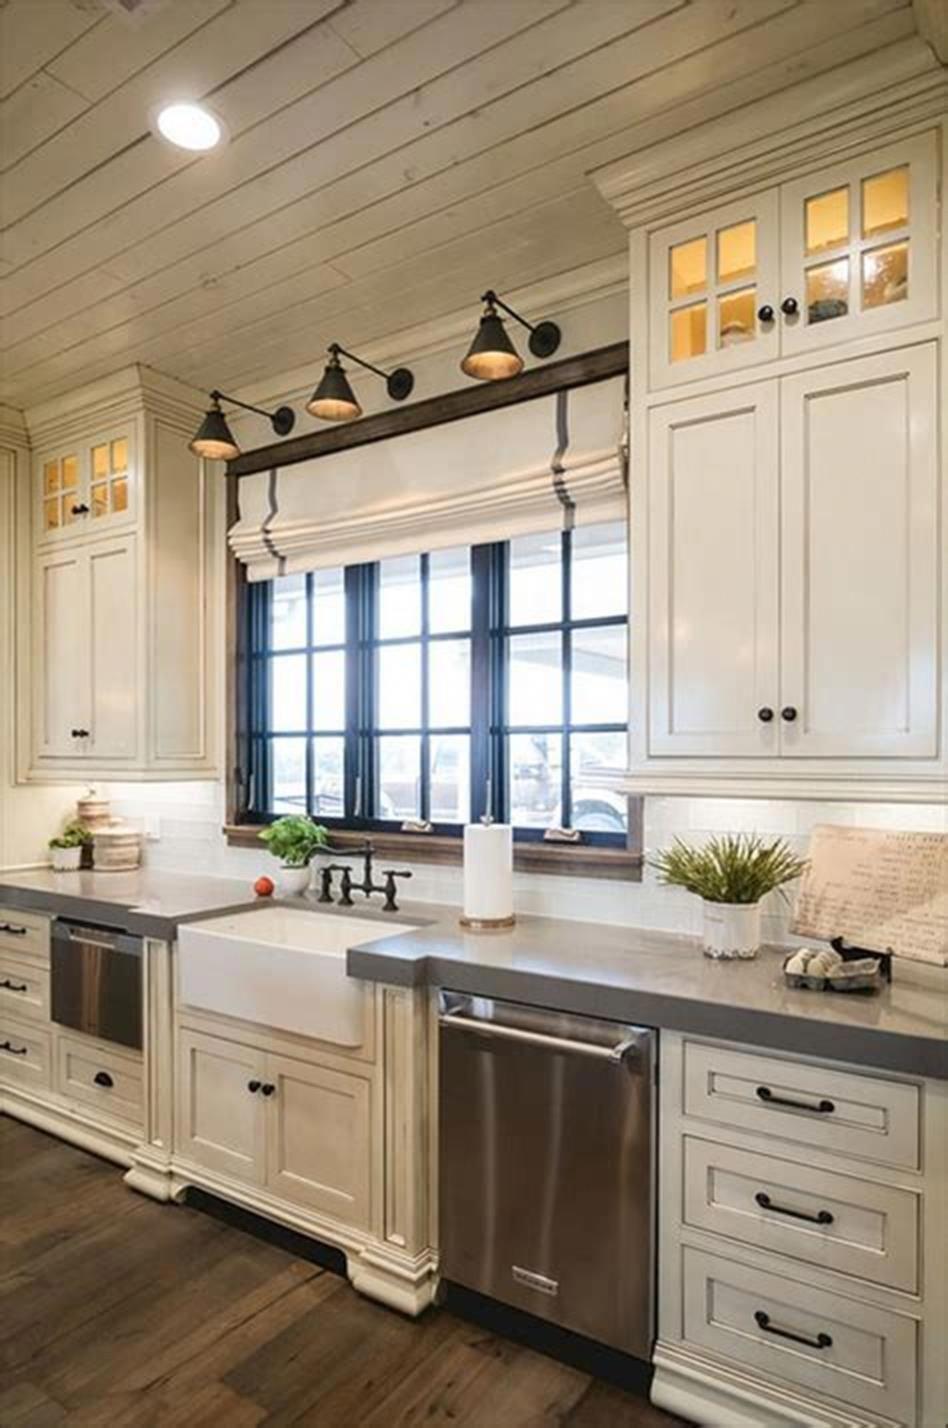 50 Gorgeous Modern Farmhouse Kitchen Decorating Ideas Decorecent Kitchen Cabinets And Backsplash Farmhouse Kitchen Decor Kitchen Cabinets Decor